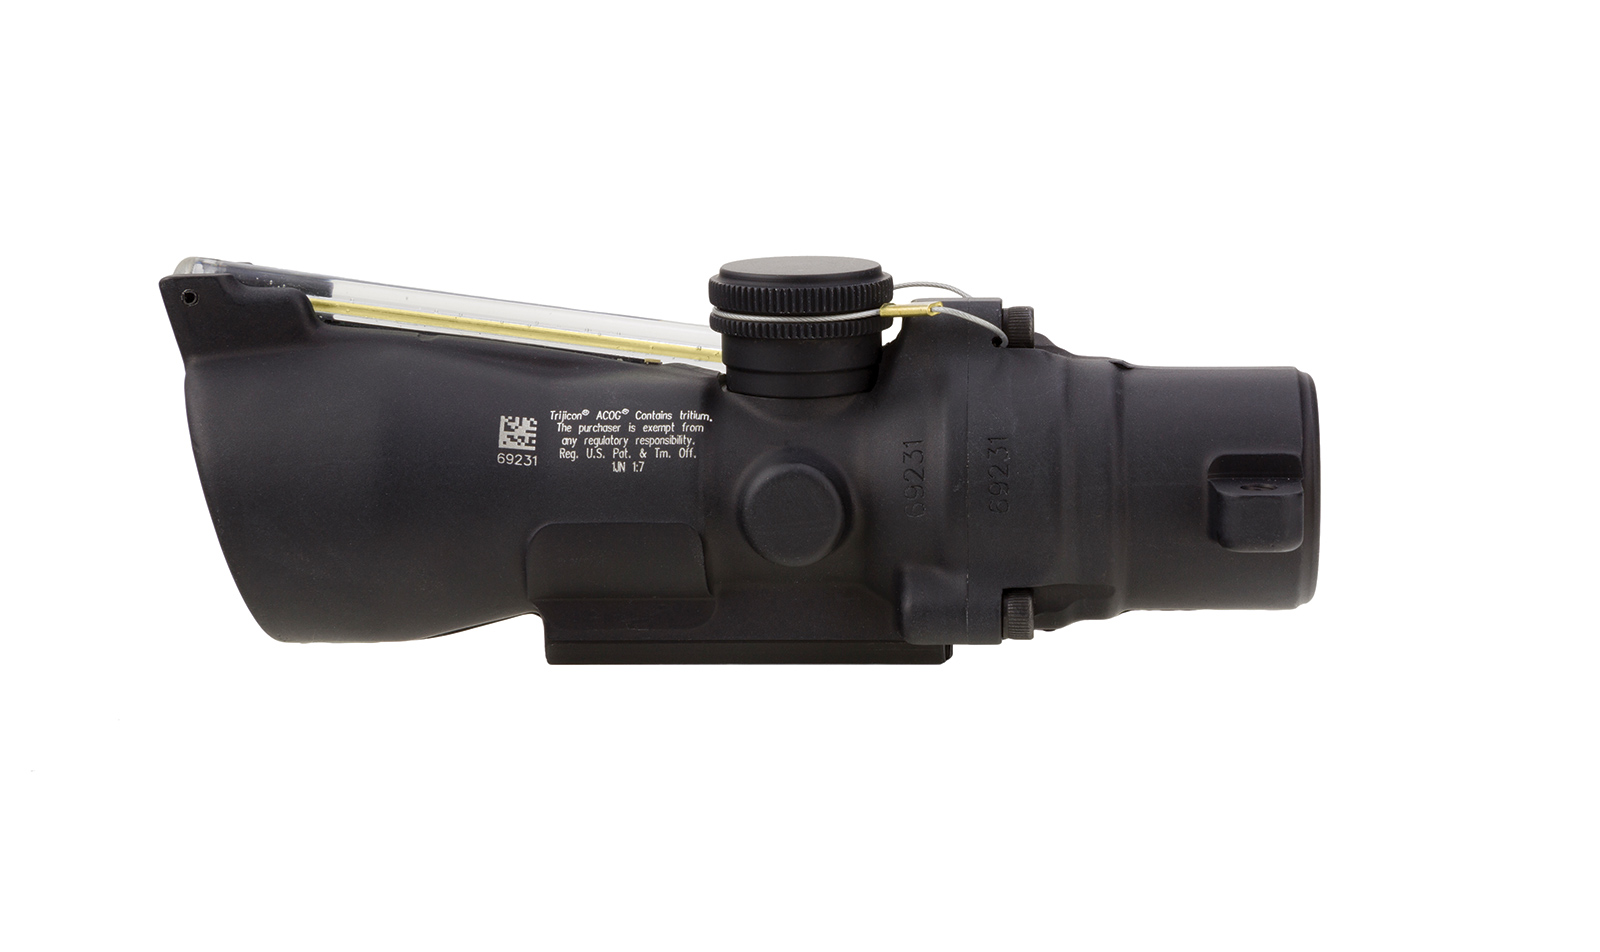 TA50-C-400236 angle 2